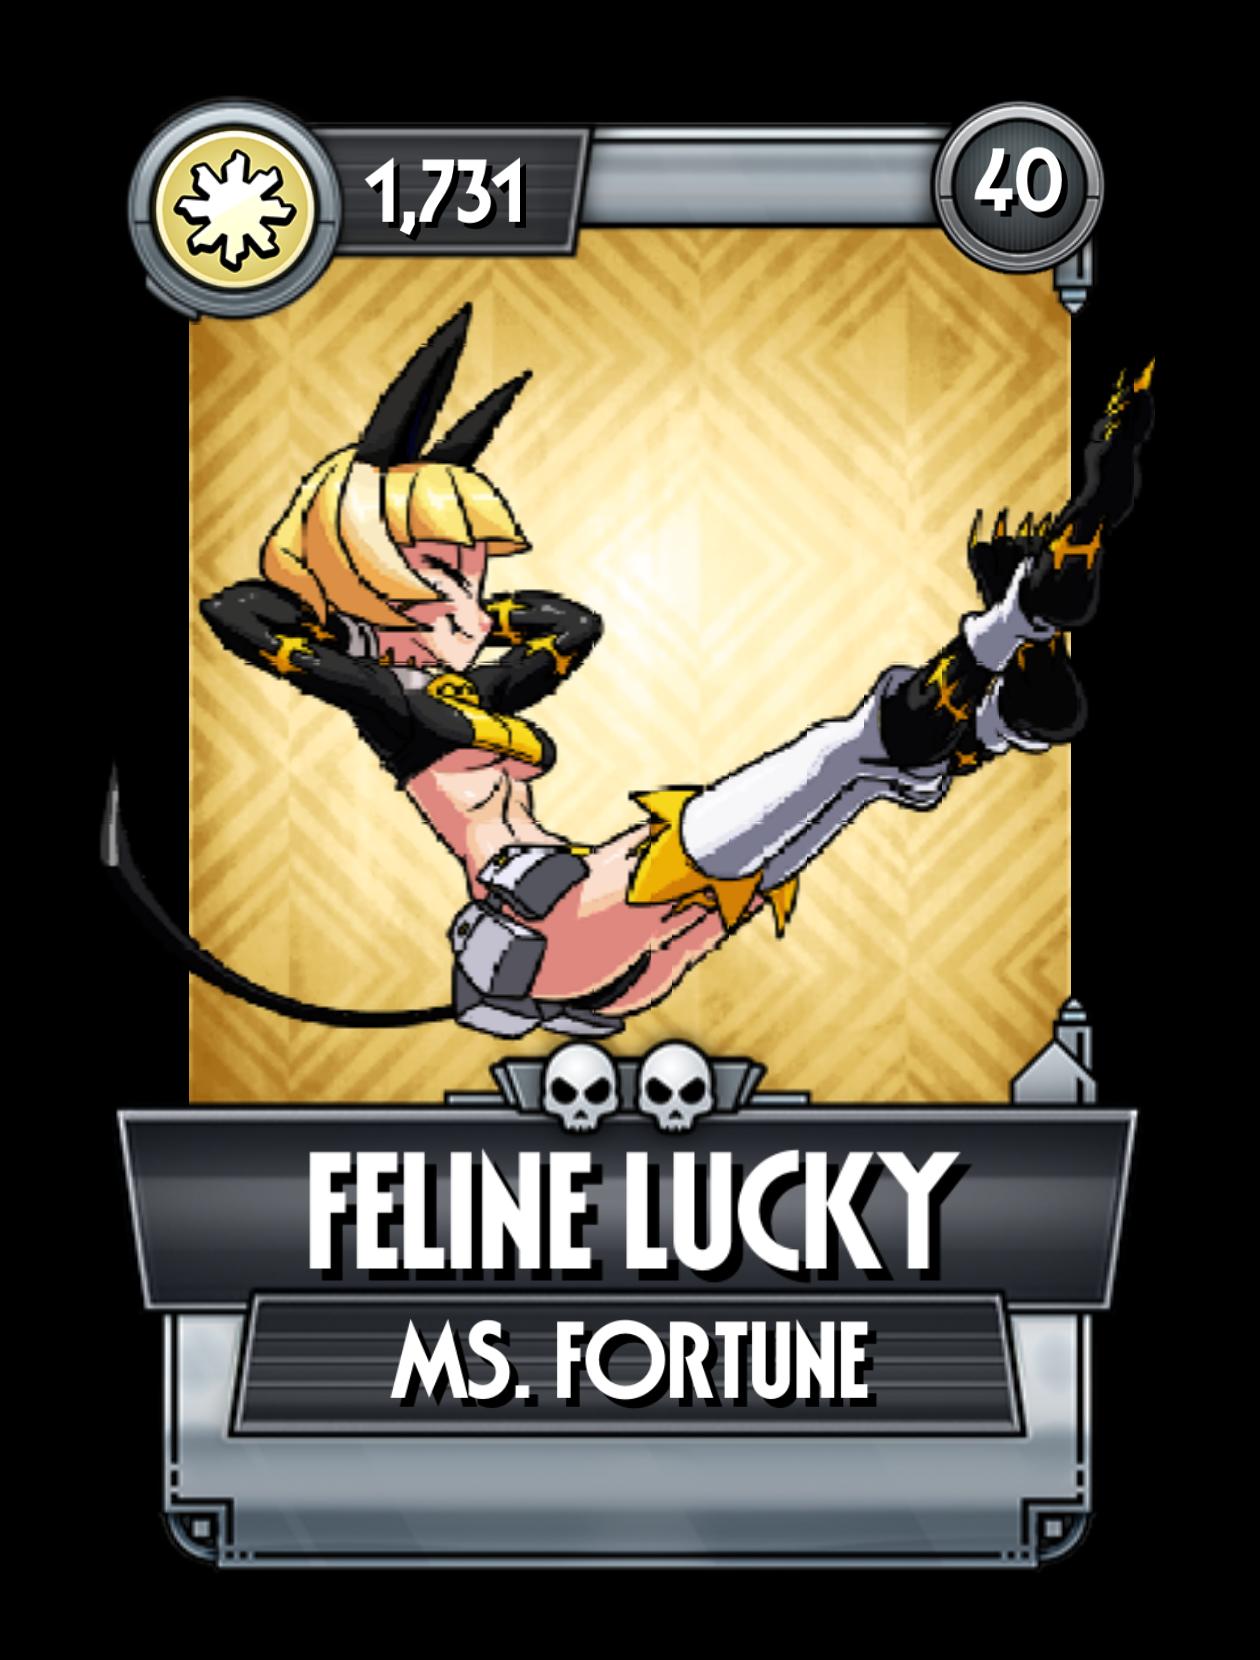 Feline Lucky